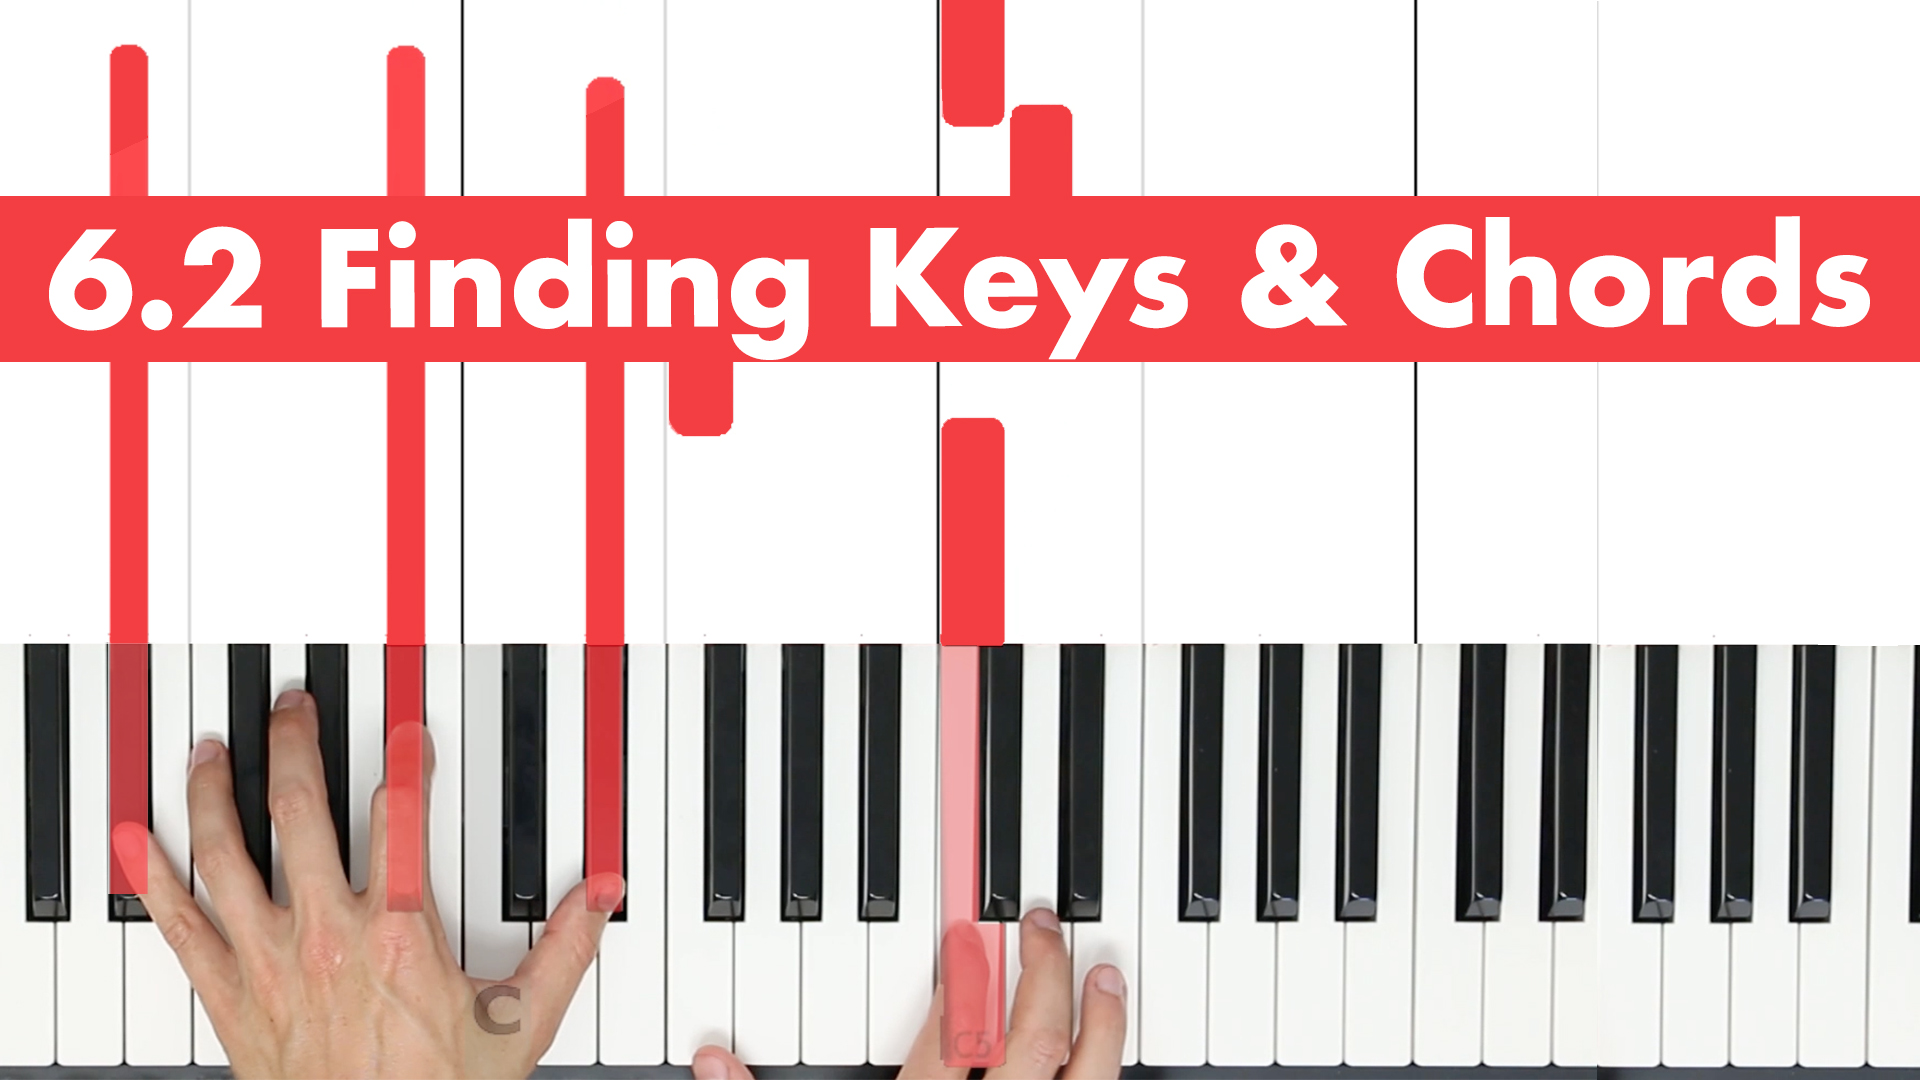 6.2 Finding Keys & Chords